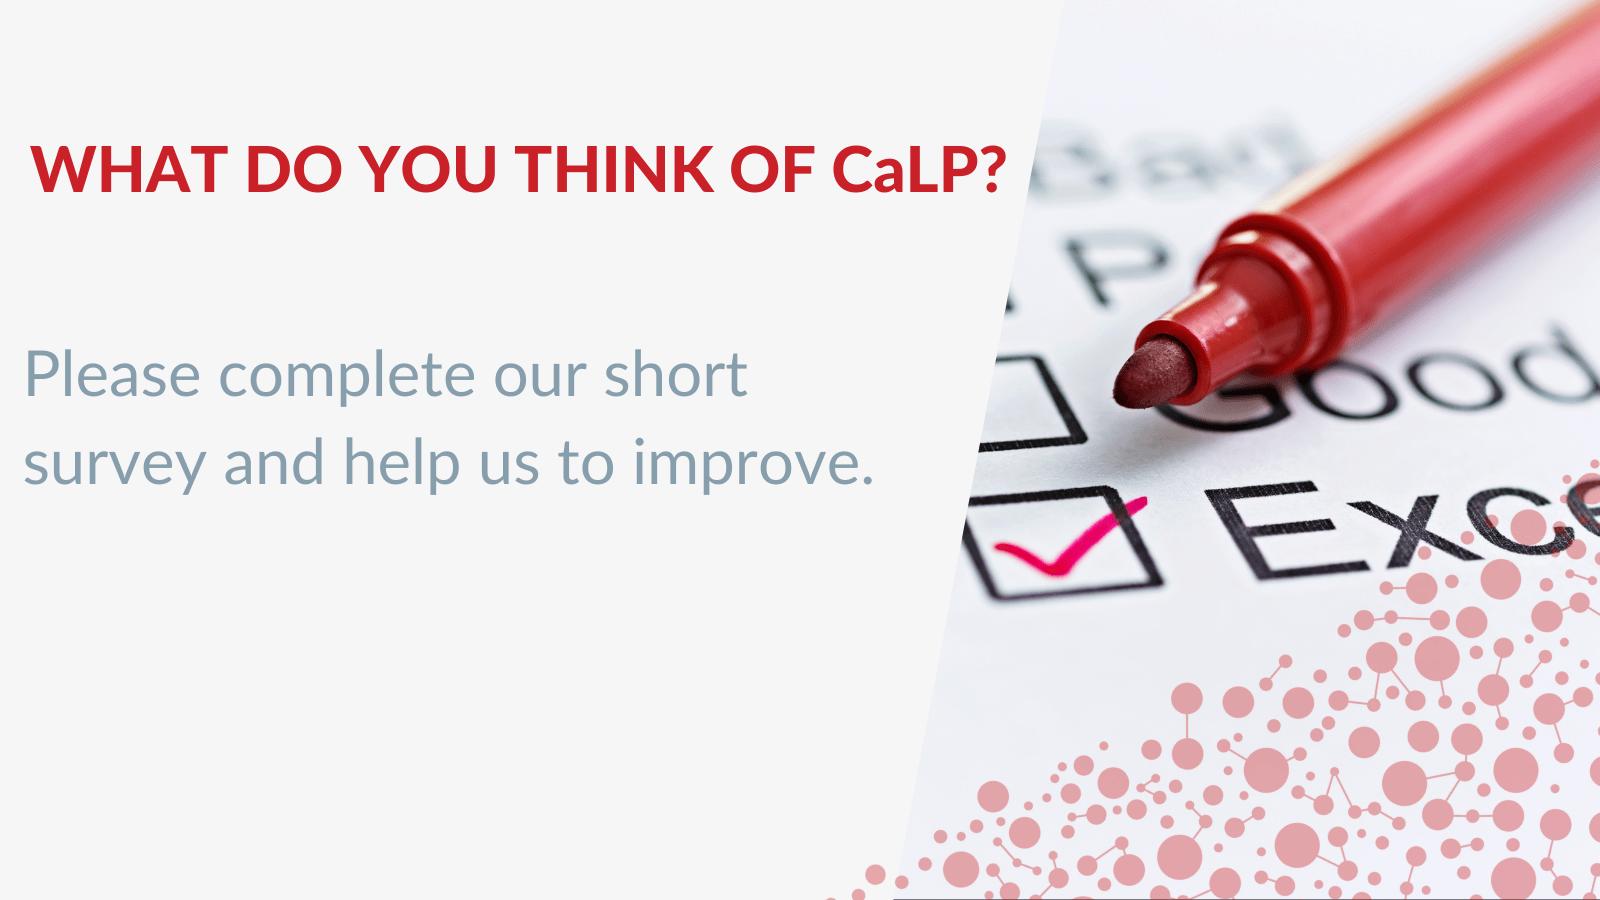 CaLP Perception survey 2021